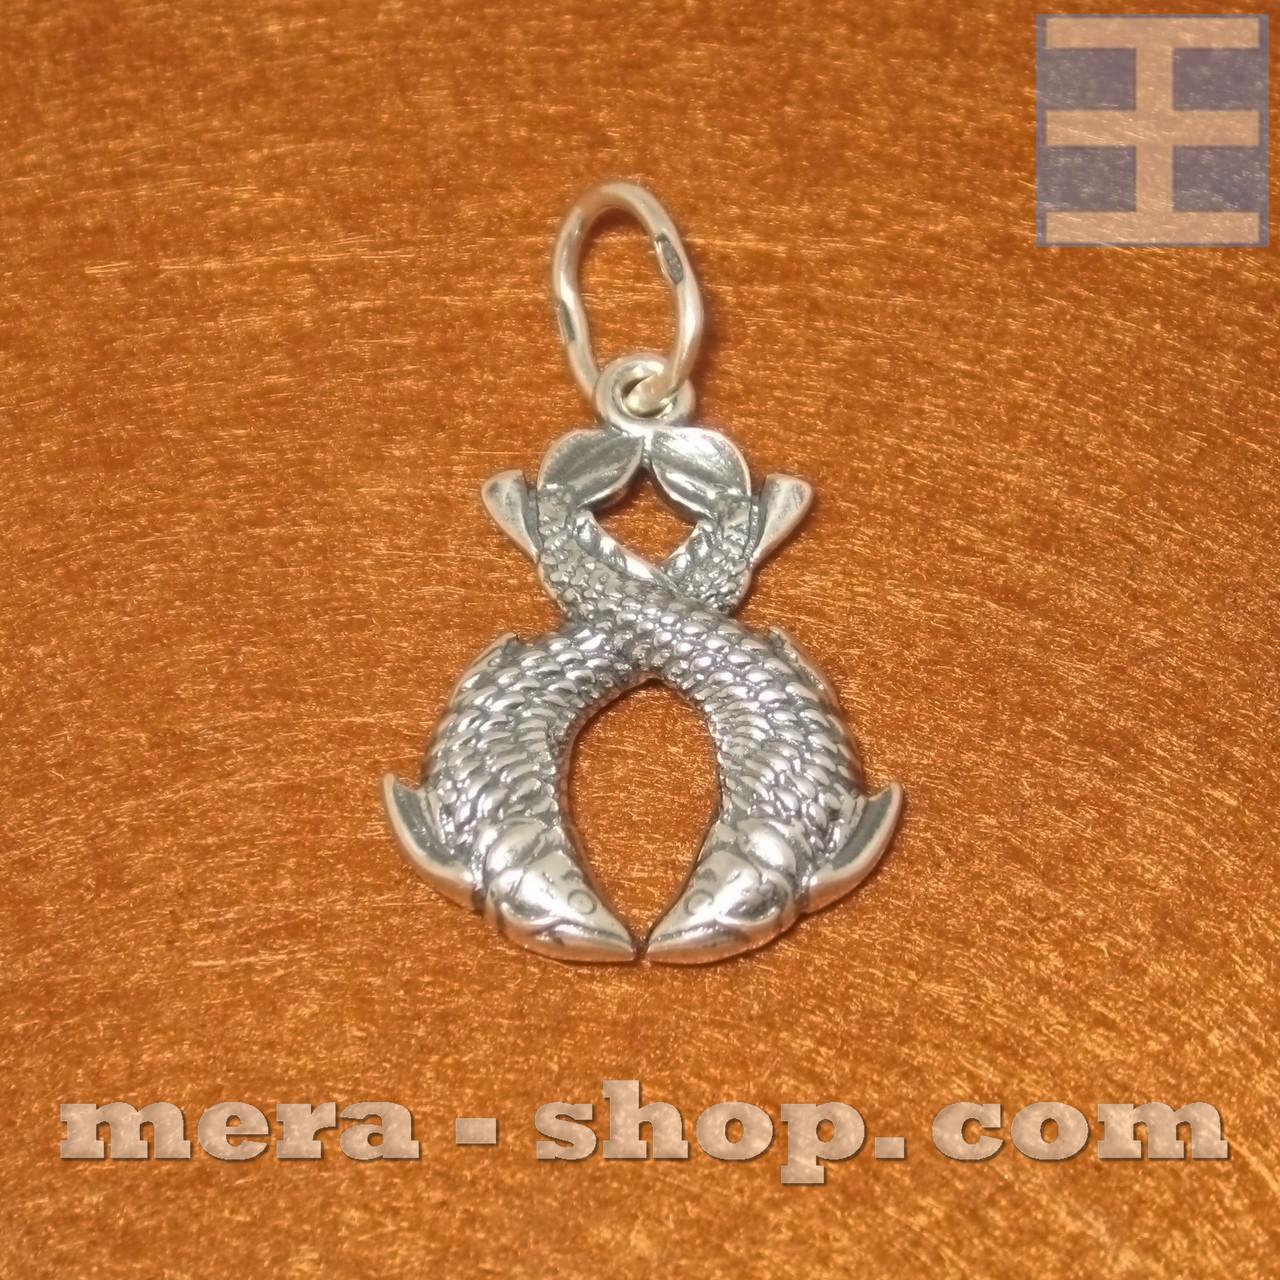 Серебряный талисман Две Рыбы, двухсторонний кулон из серебра 925 пробы (24 х 22 мм, 6.5 г)